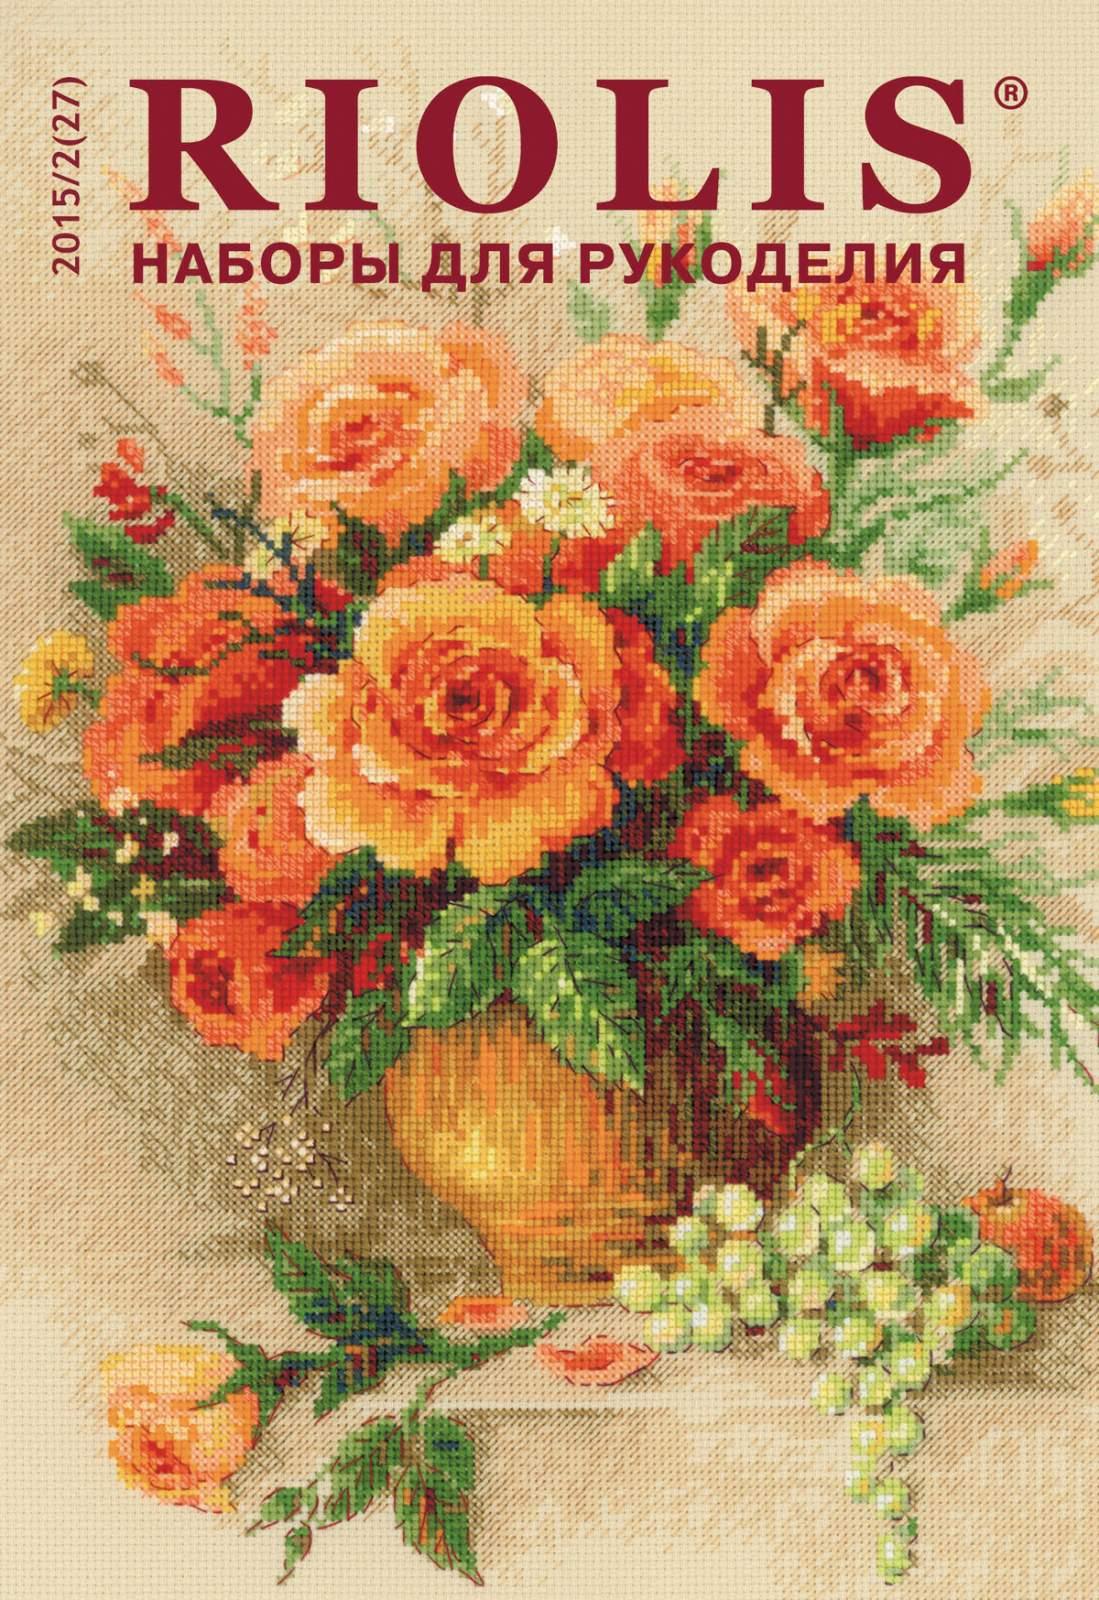 27-й каталог РИОЛИС